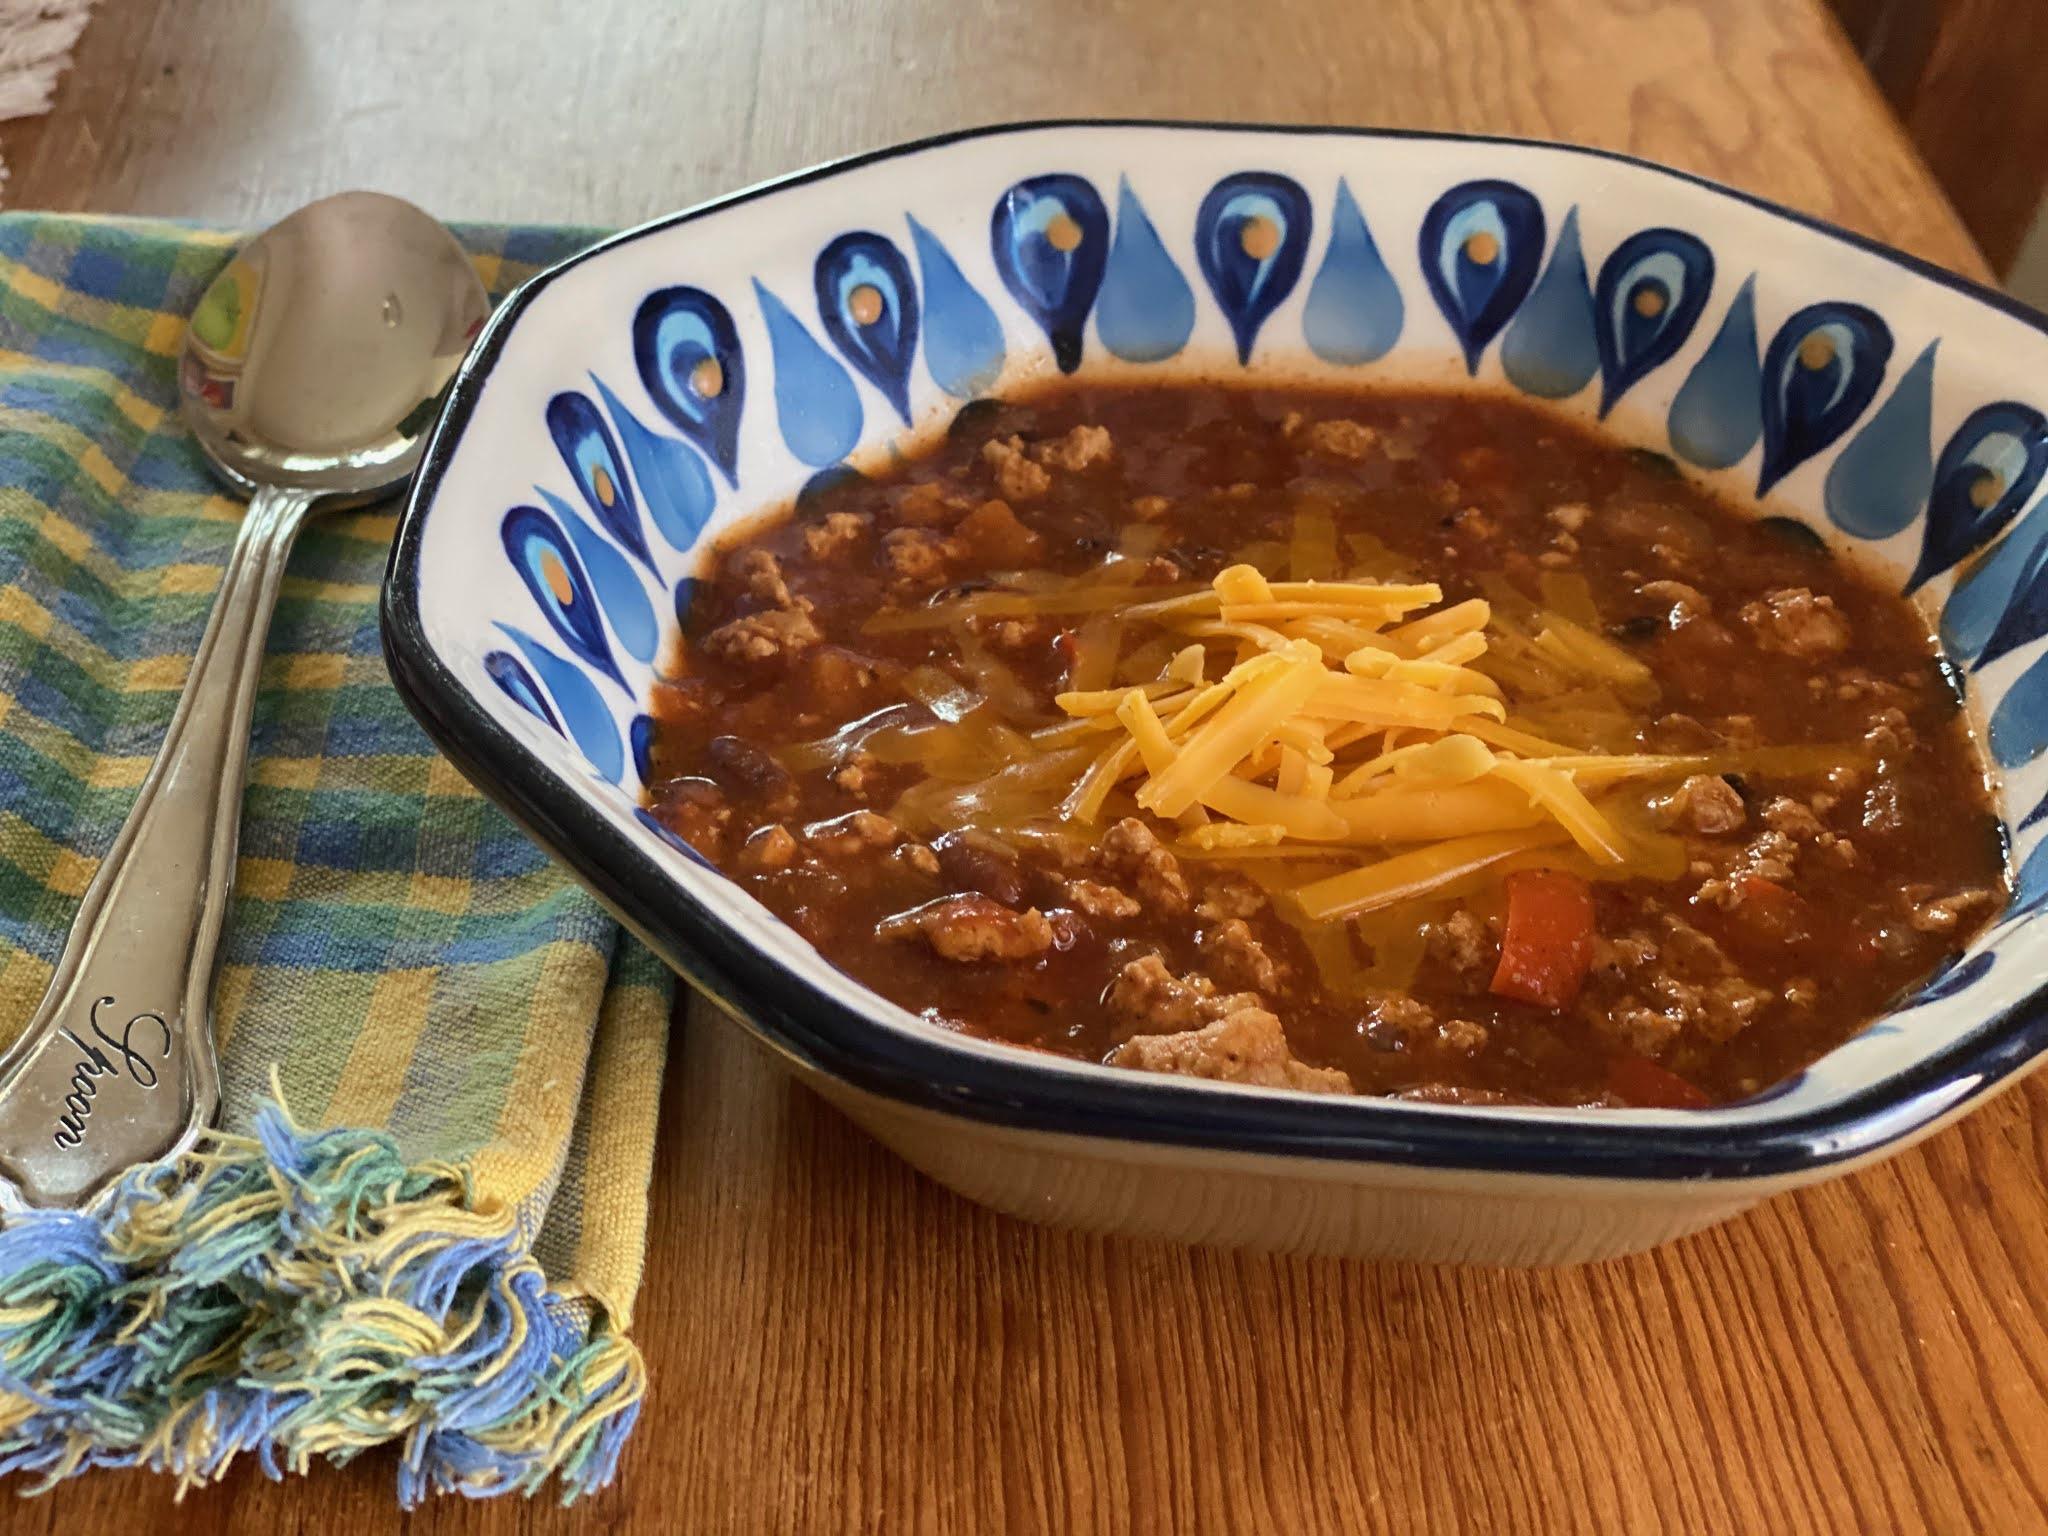 Krismulkey Com Spicy Turkey Chili Recipe